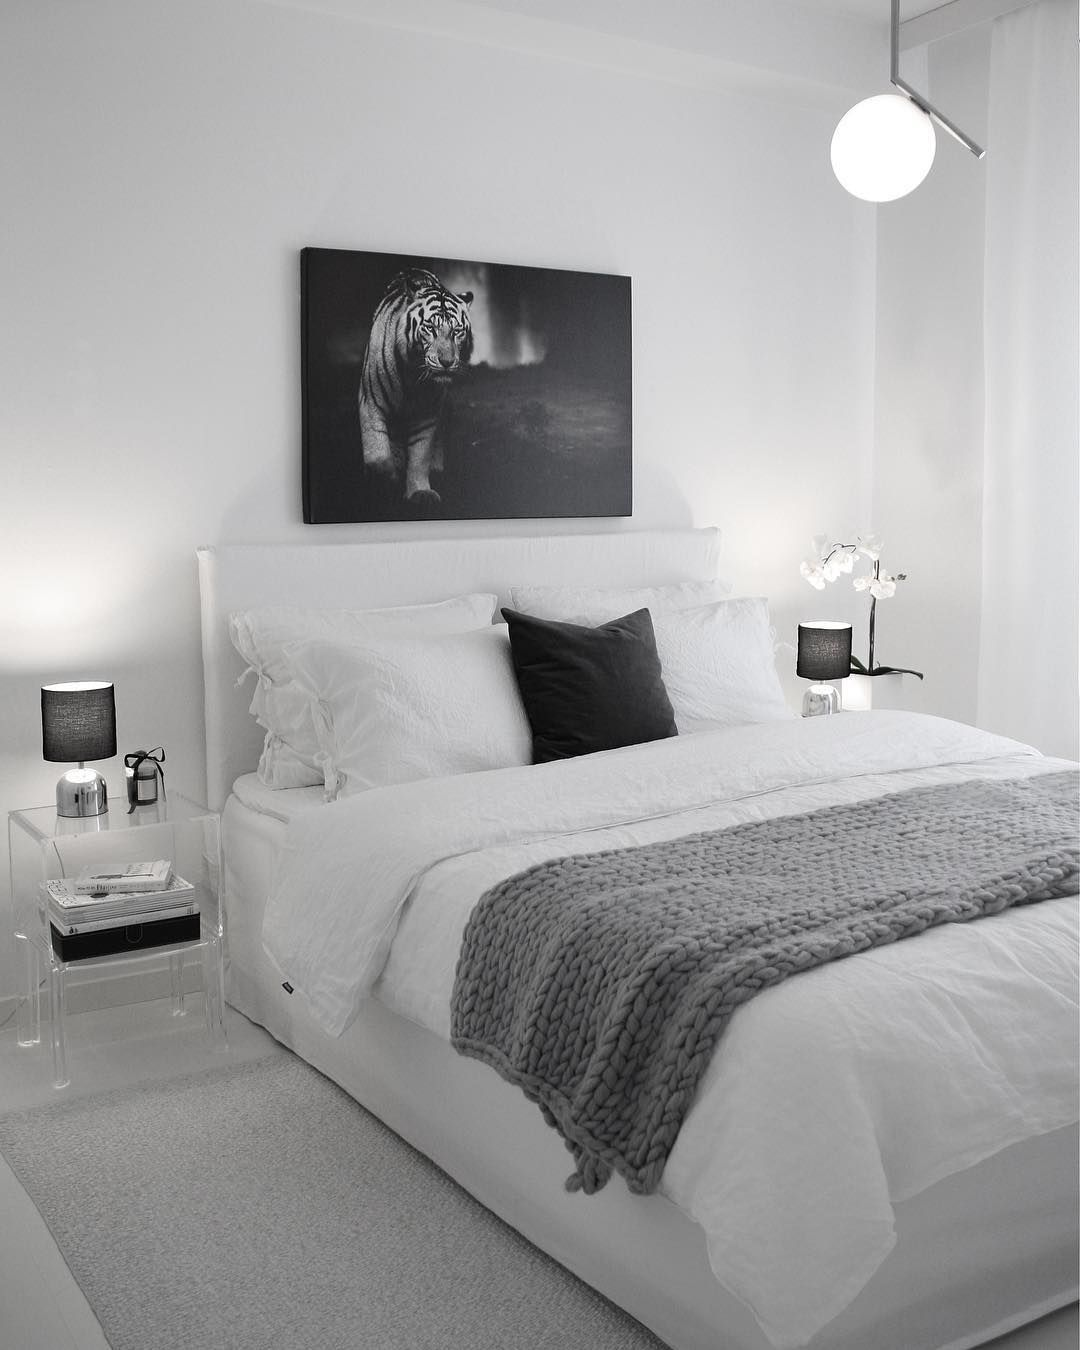 Black Amp White Bedroom Room Aesthetic Goals Black Black White Bedrooms Aesthetic Bedroom Black Curtains Bedroom